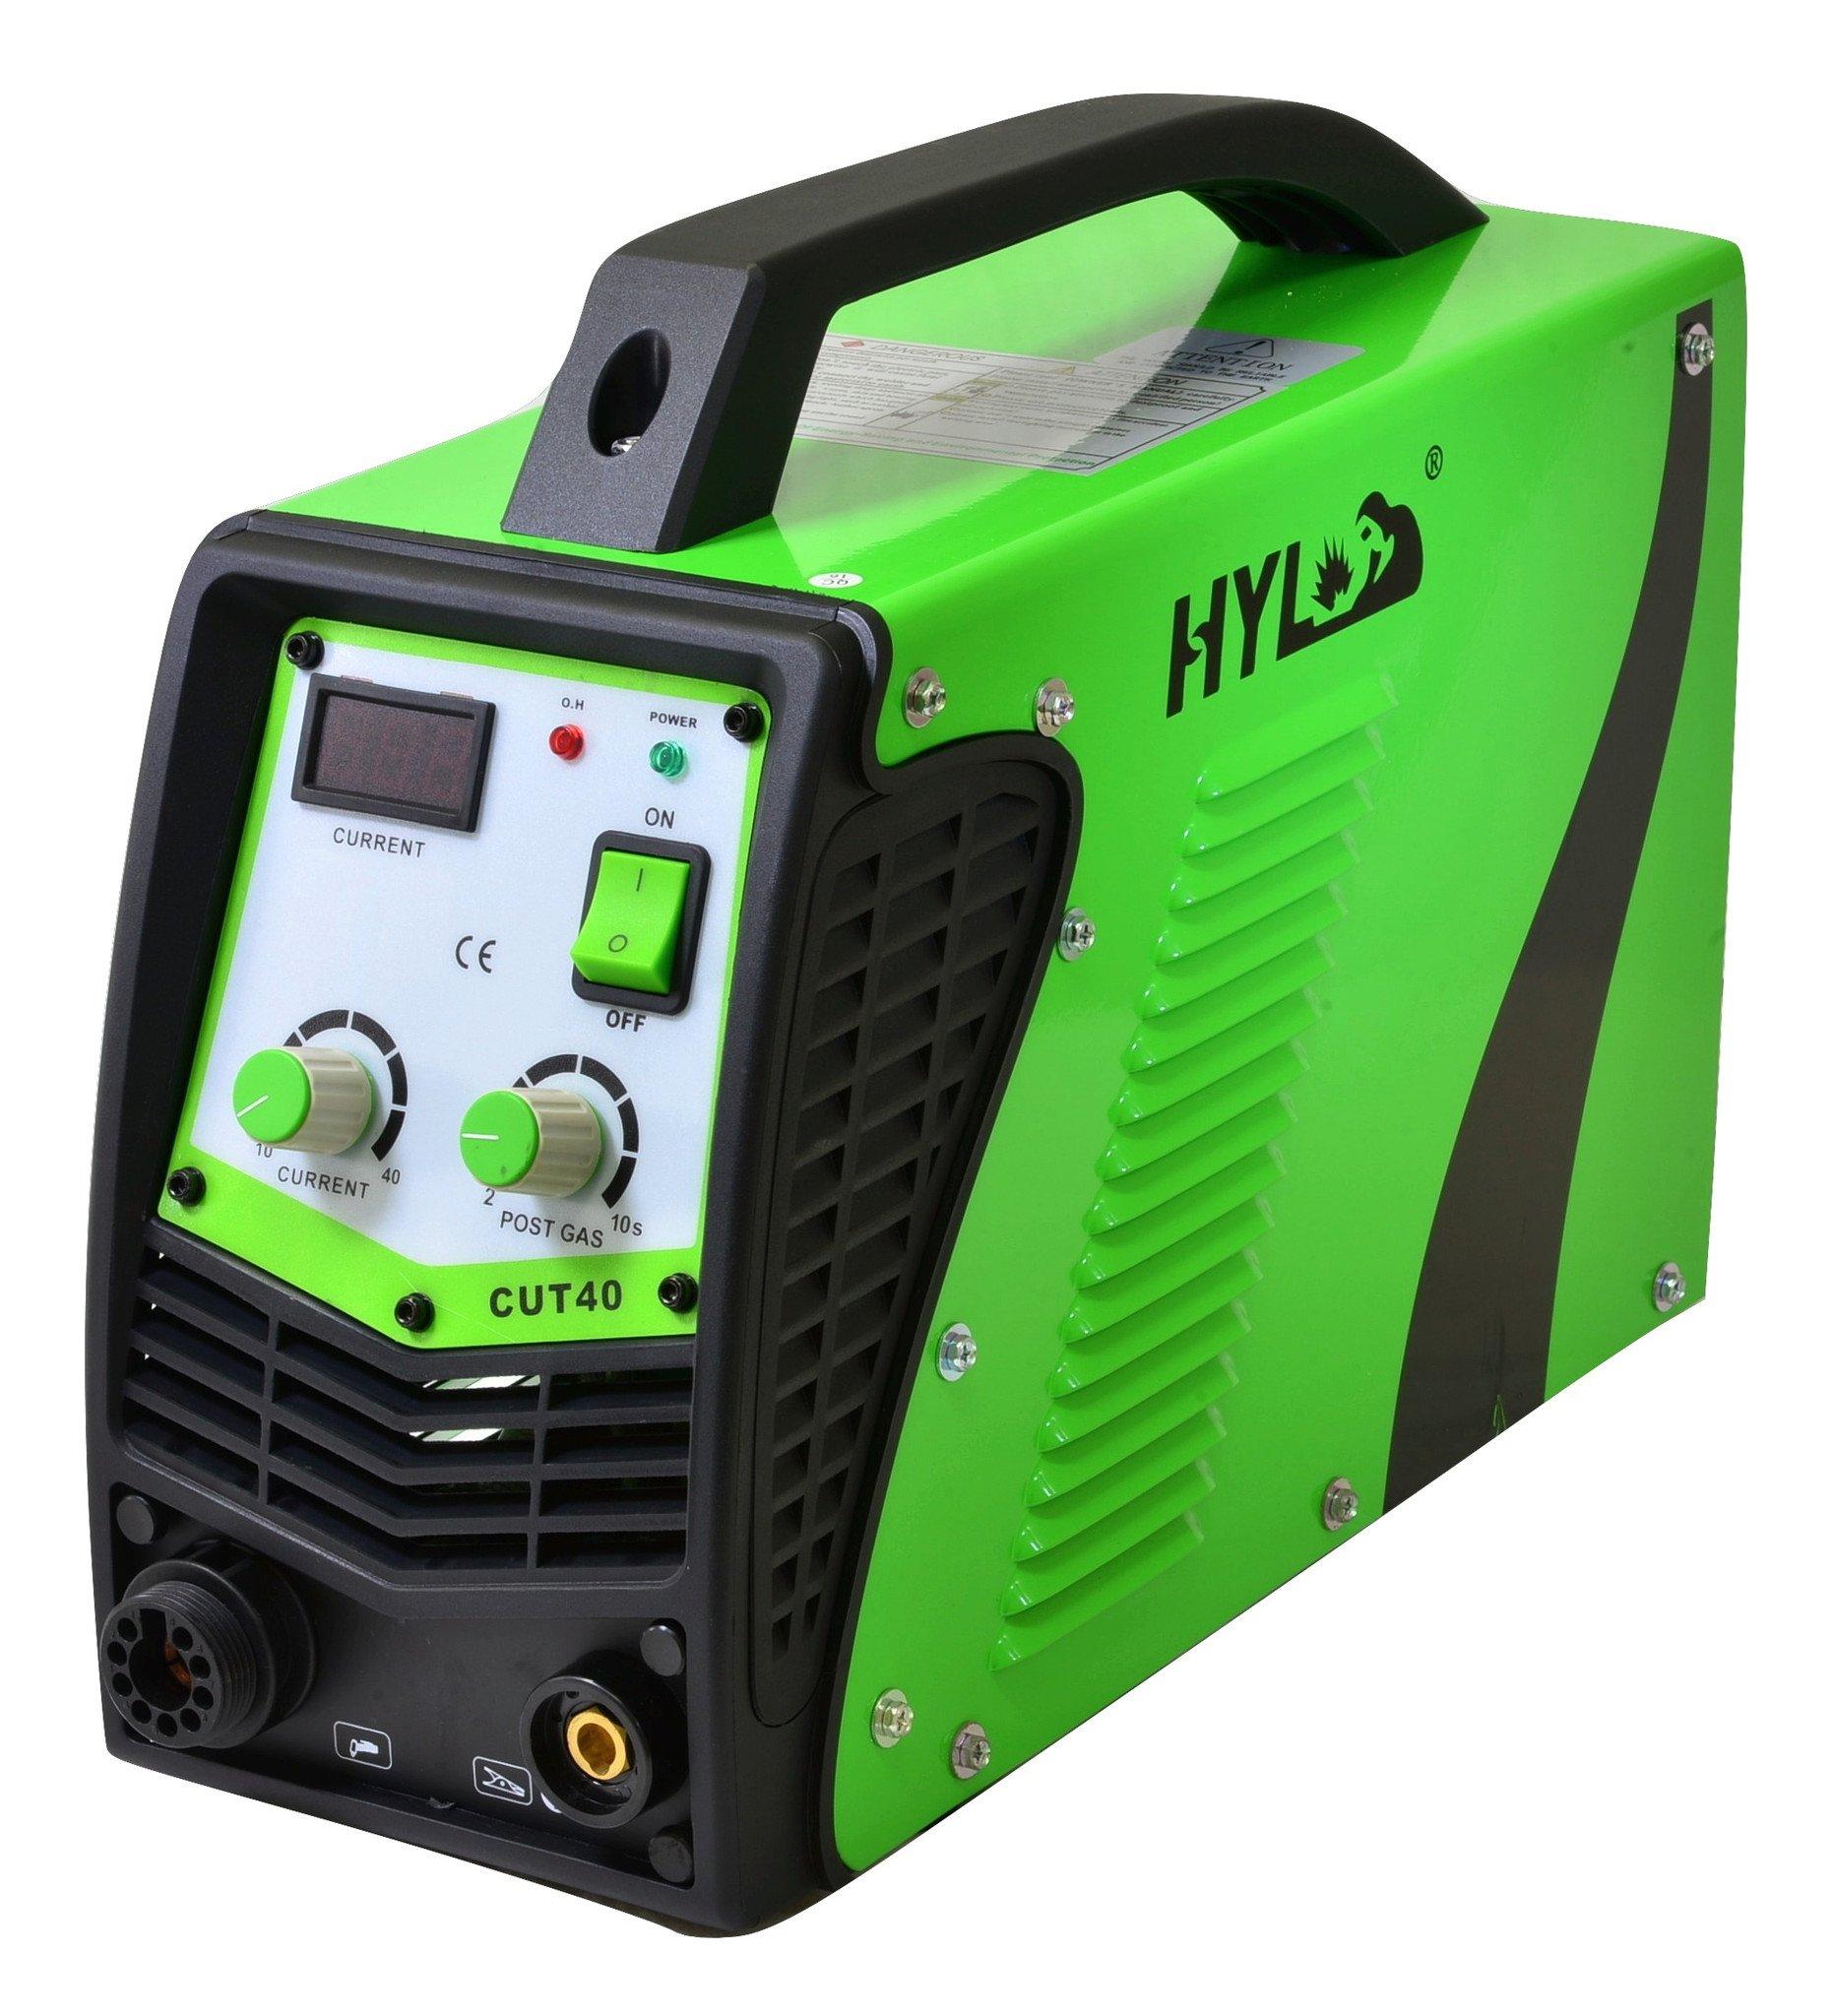 HYL CUT40C Plasma Cutter - Portable Plasma Cutter - 2YR USA WARRANTY WITH USA BASED PARTS AND SERVICE …